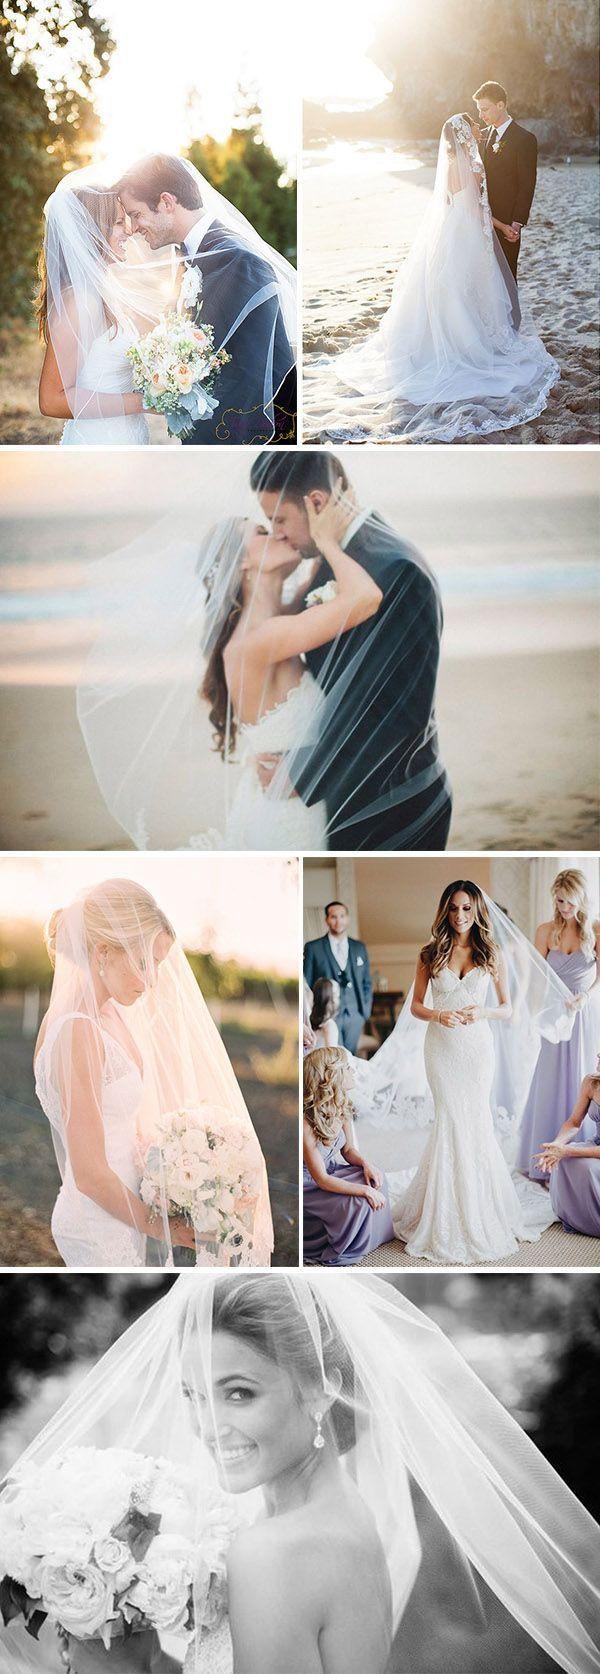 Wedding hair accessories gorgeous bridal veils from ewi veil